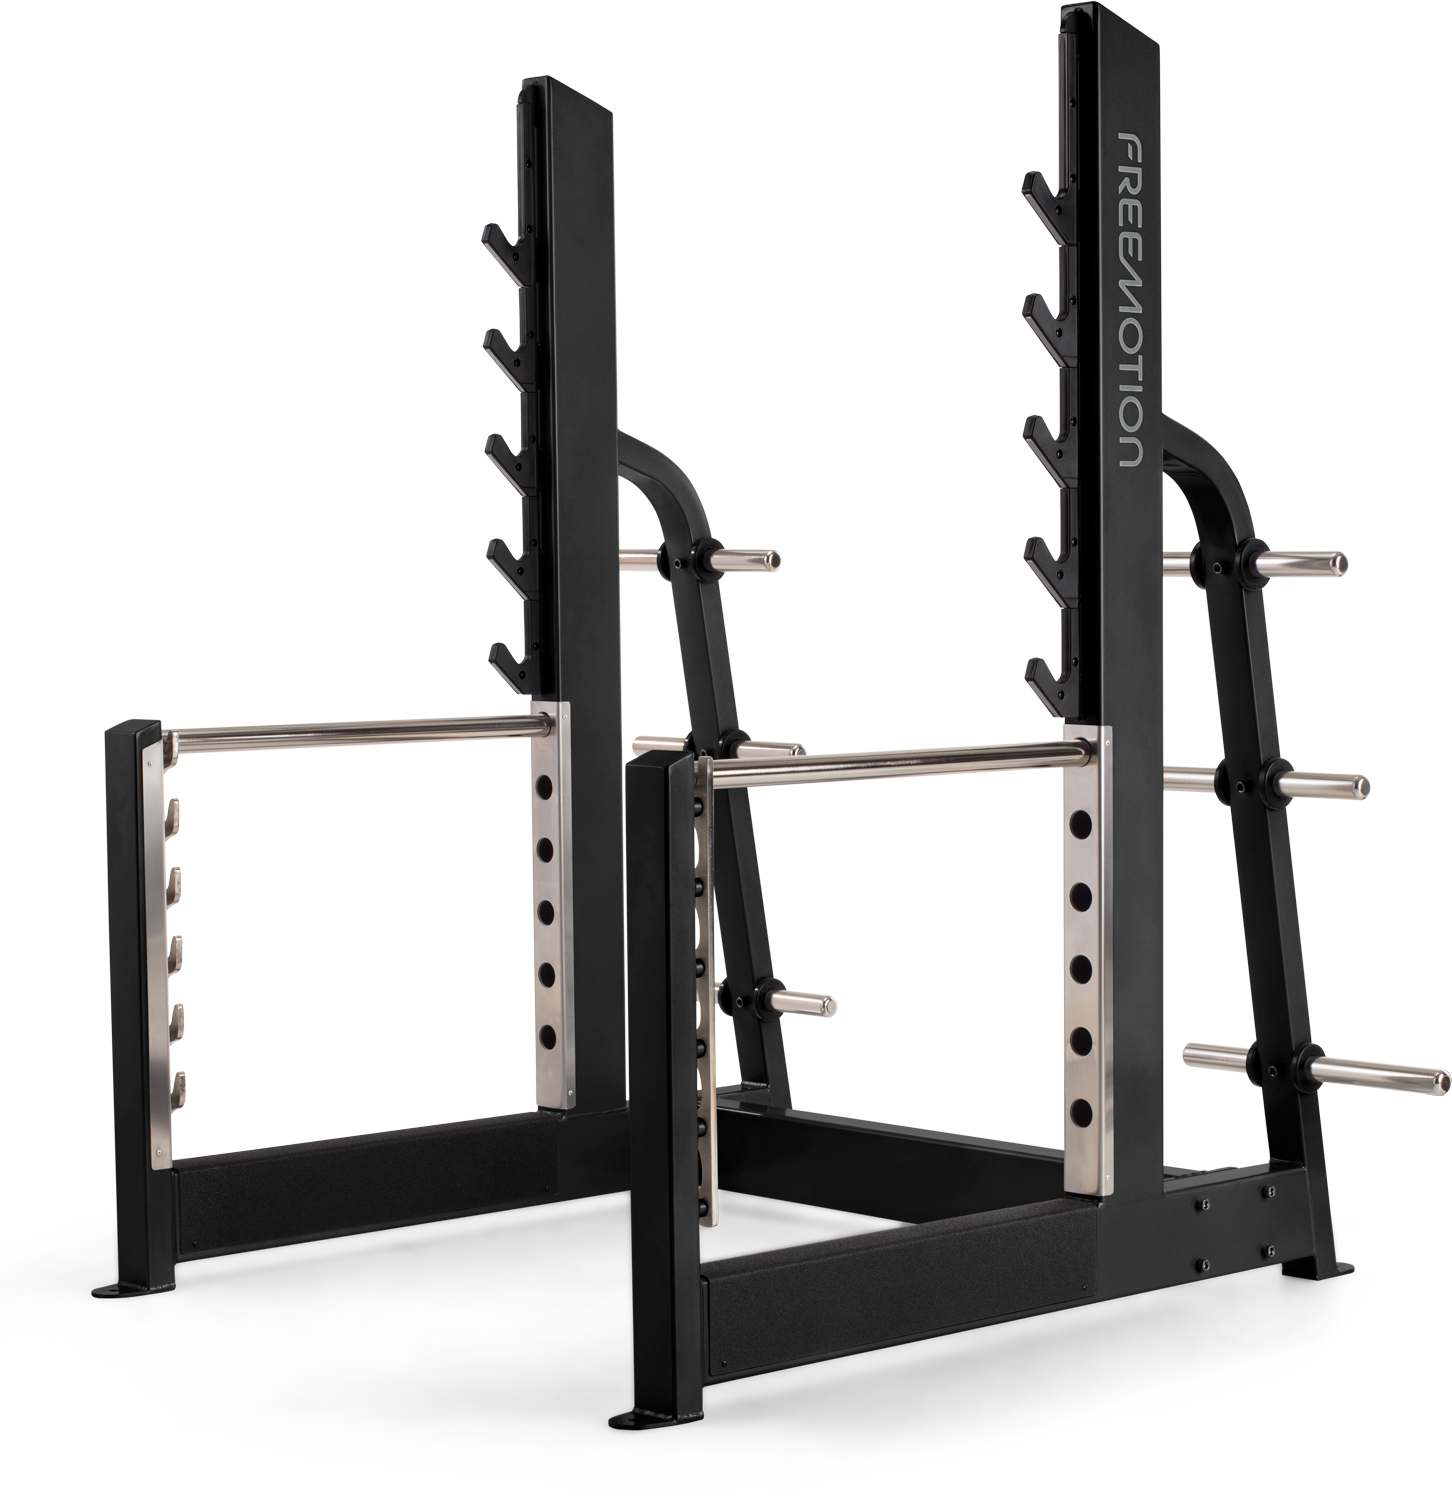 Freemotion EPIC Olympic Squat Rack